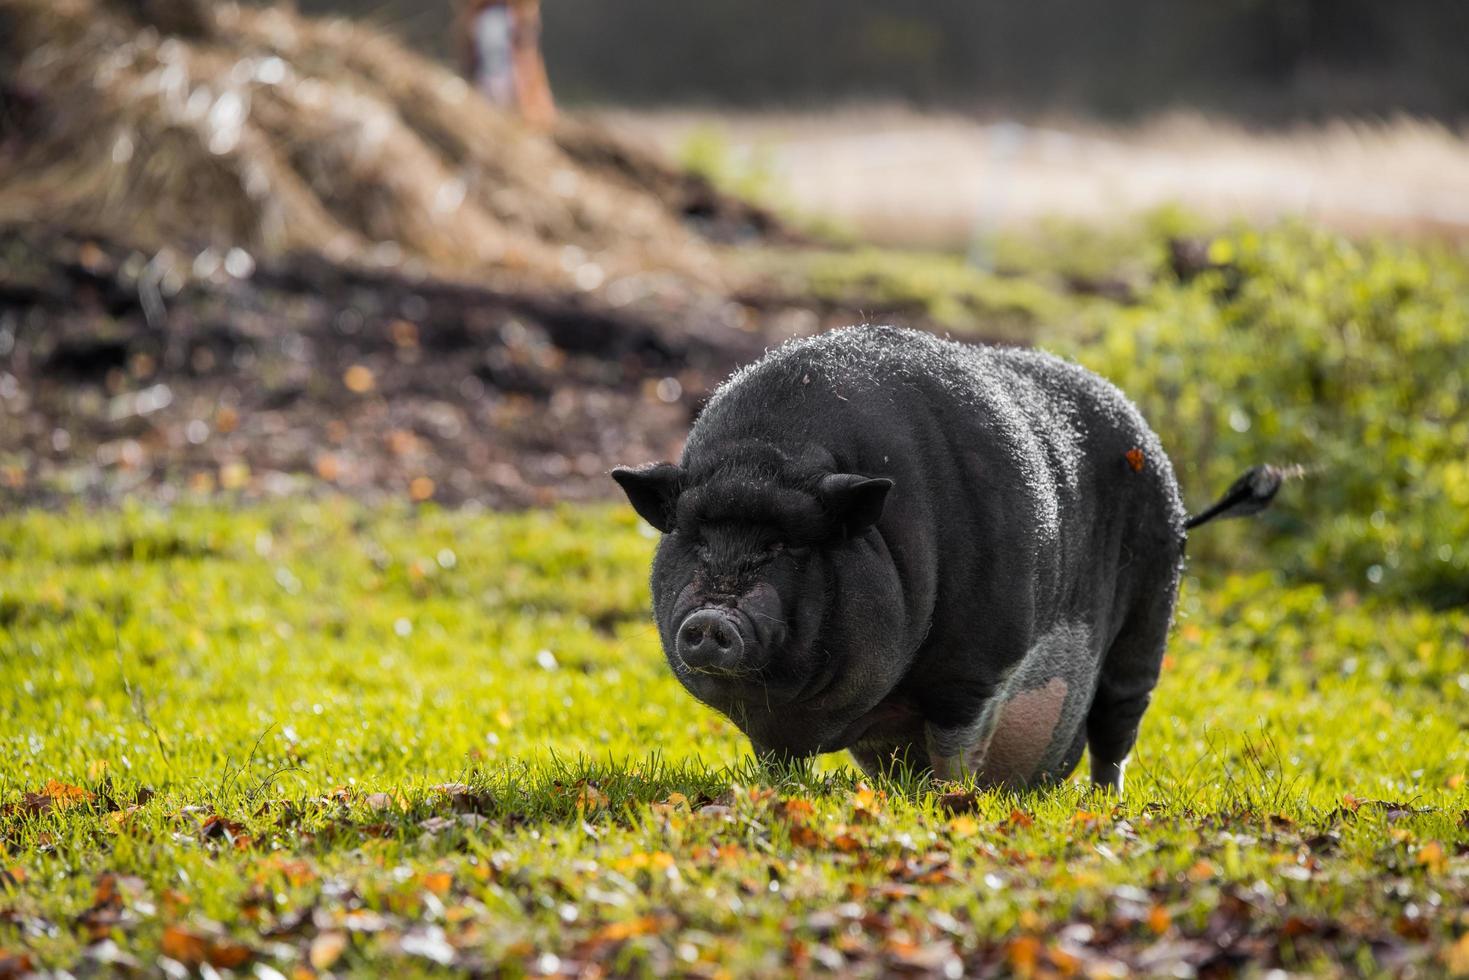 Black pig in green grass photo